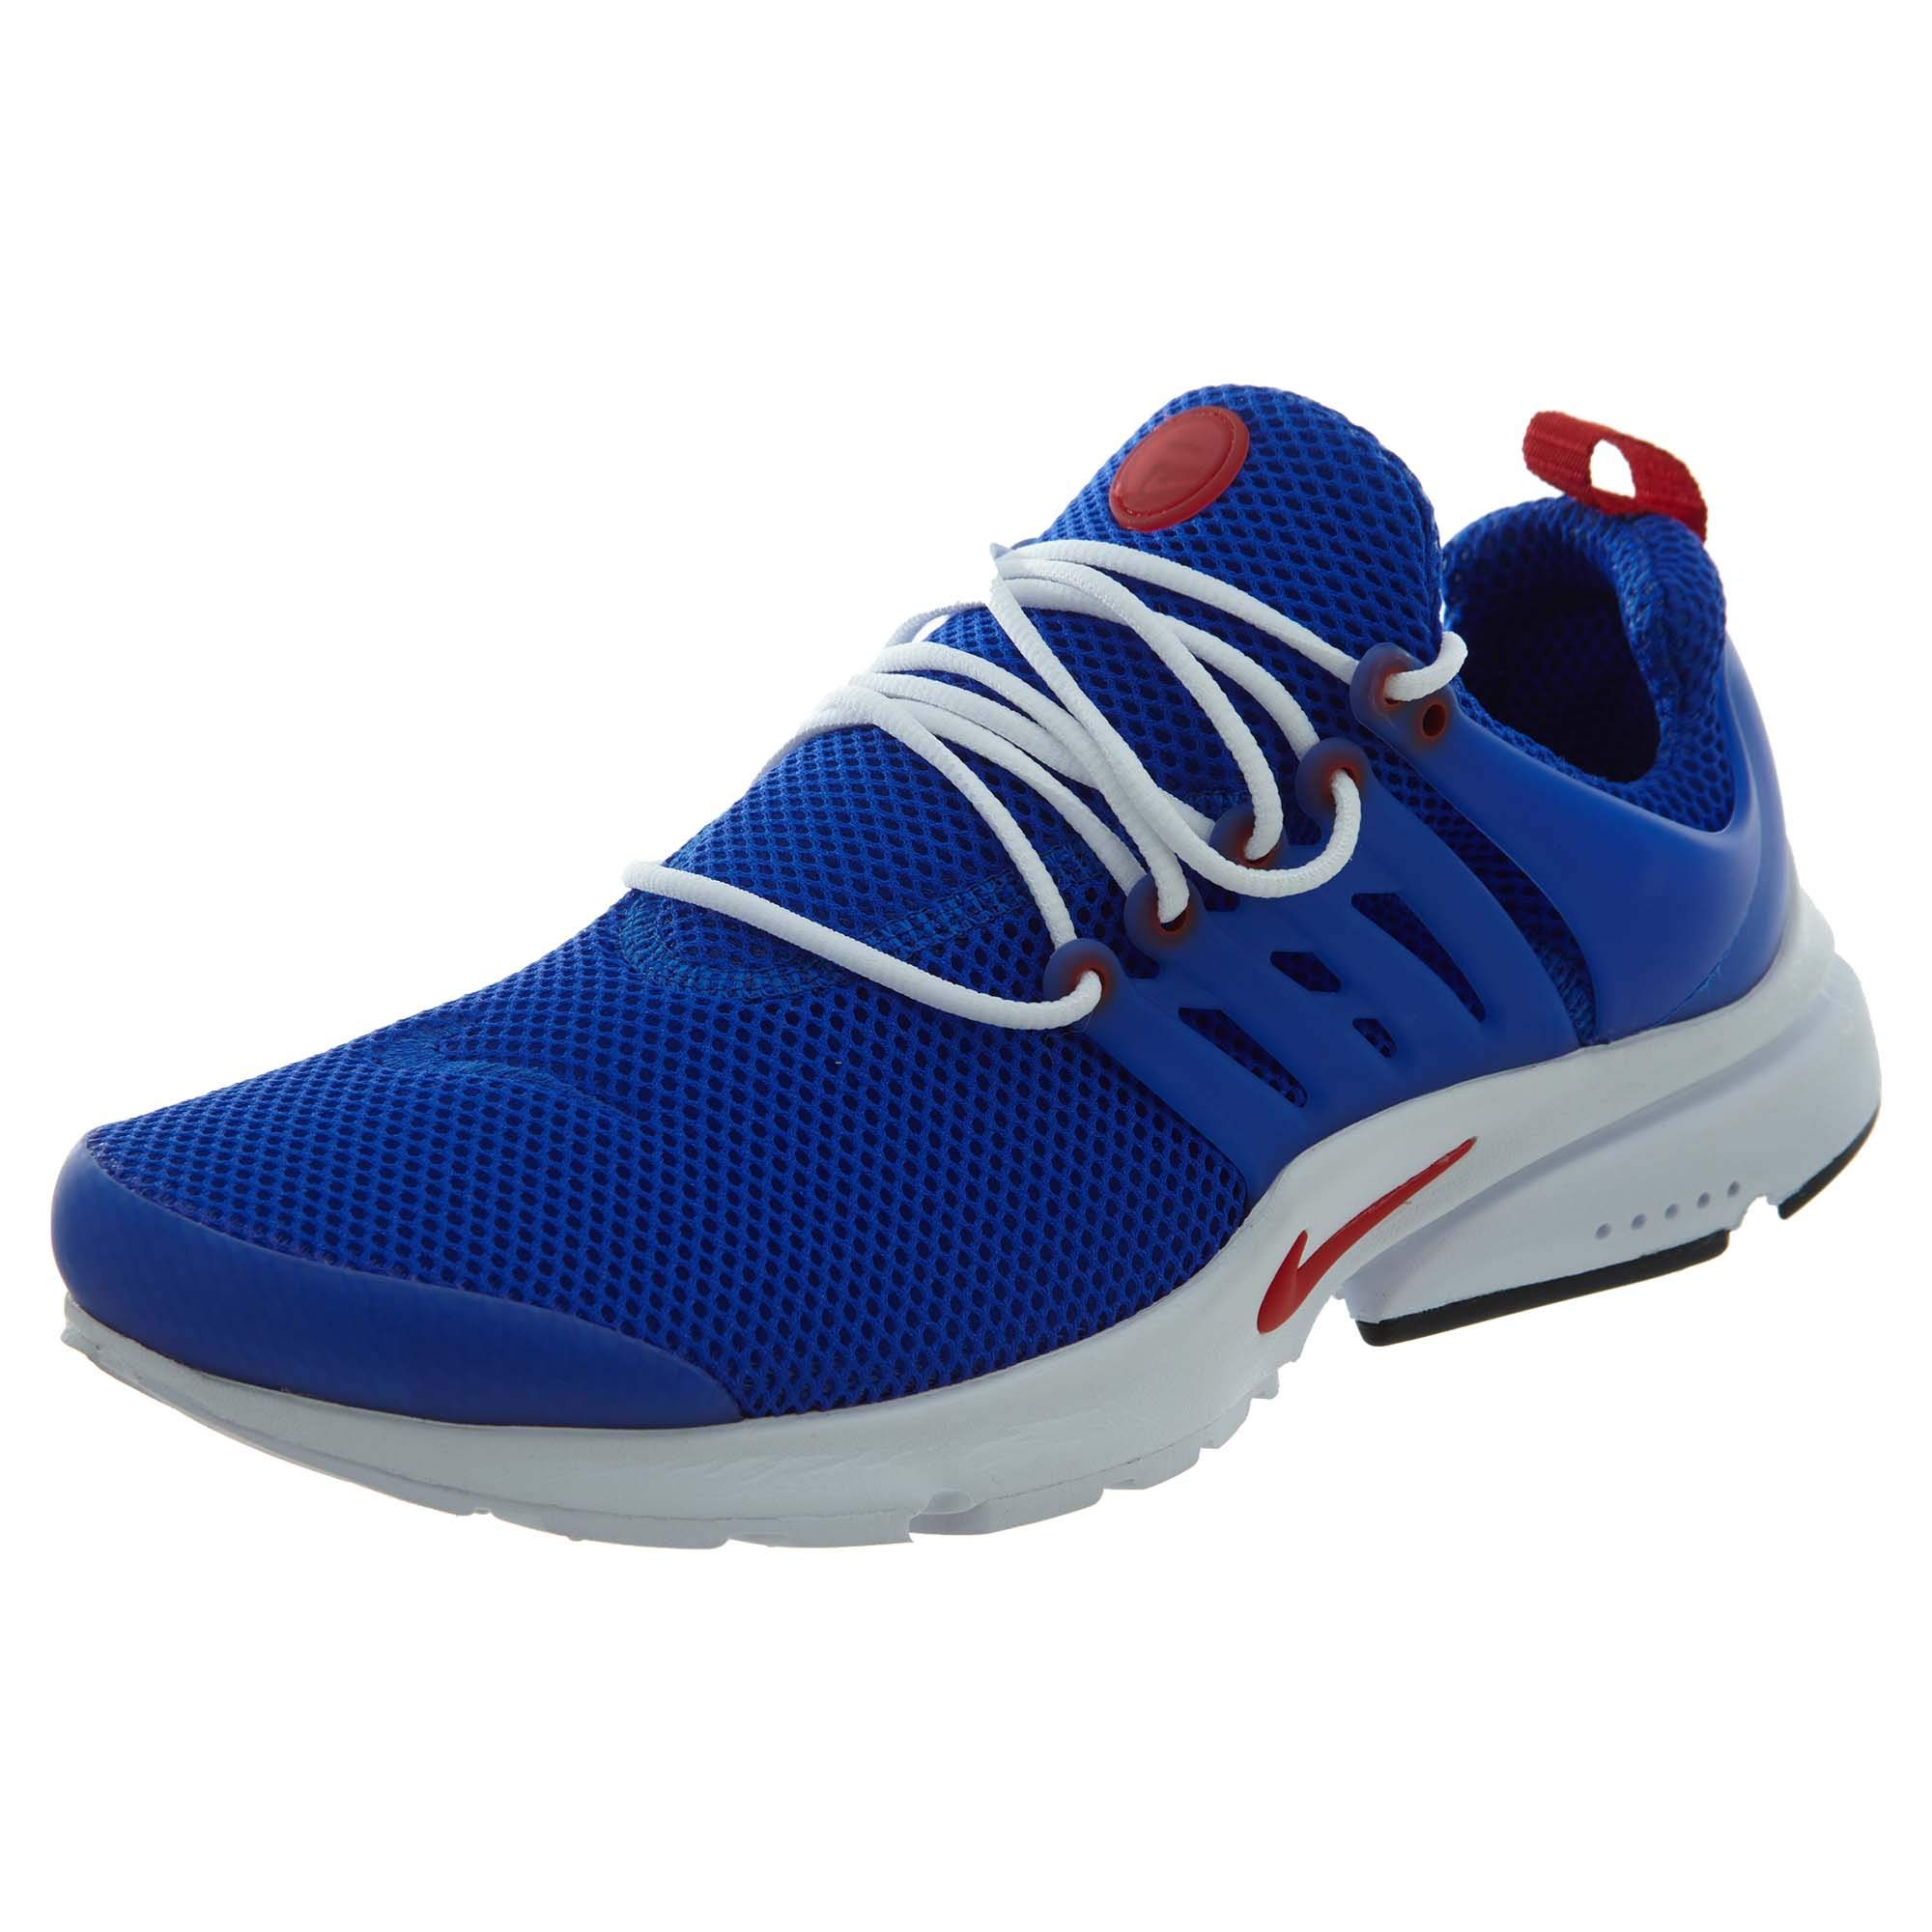 Nike Men's Air Presto Essential Running Shoe Size 6